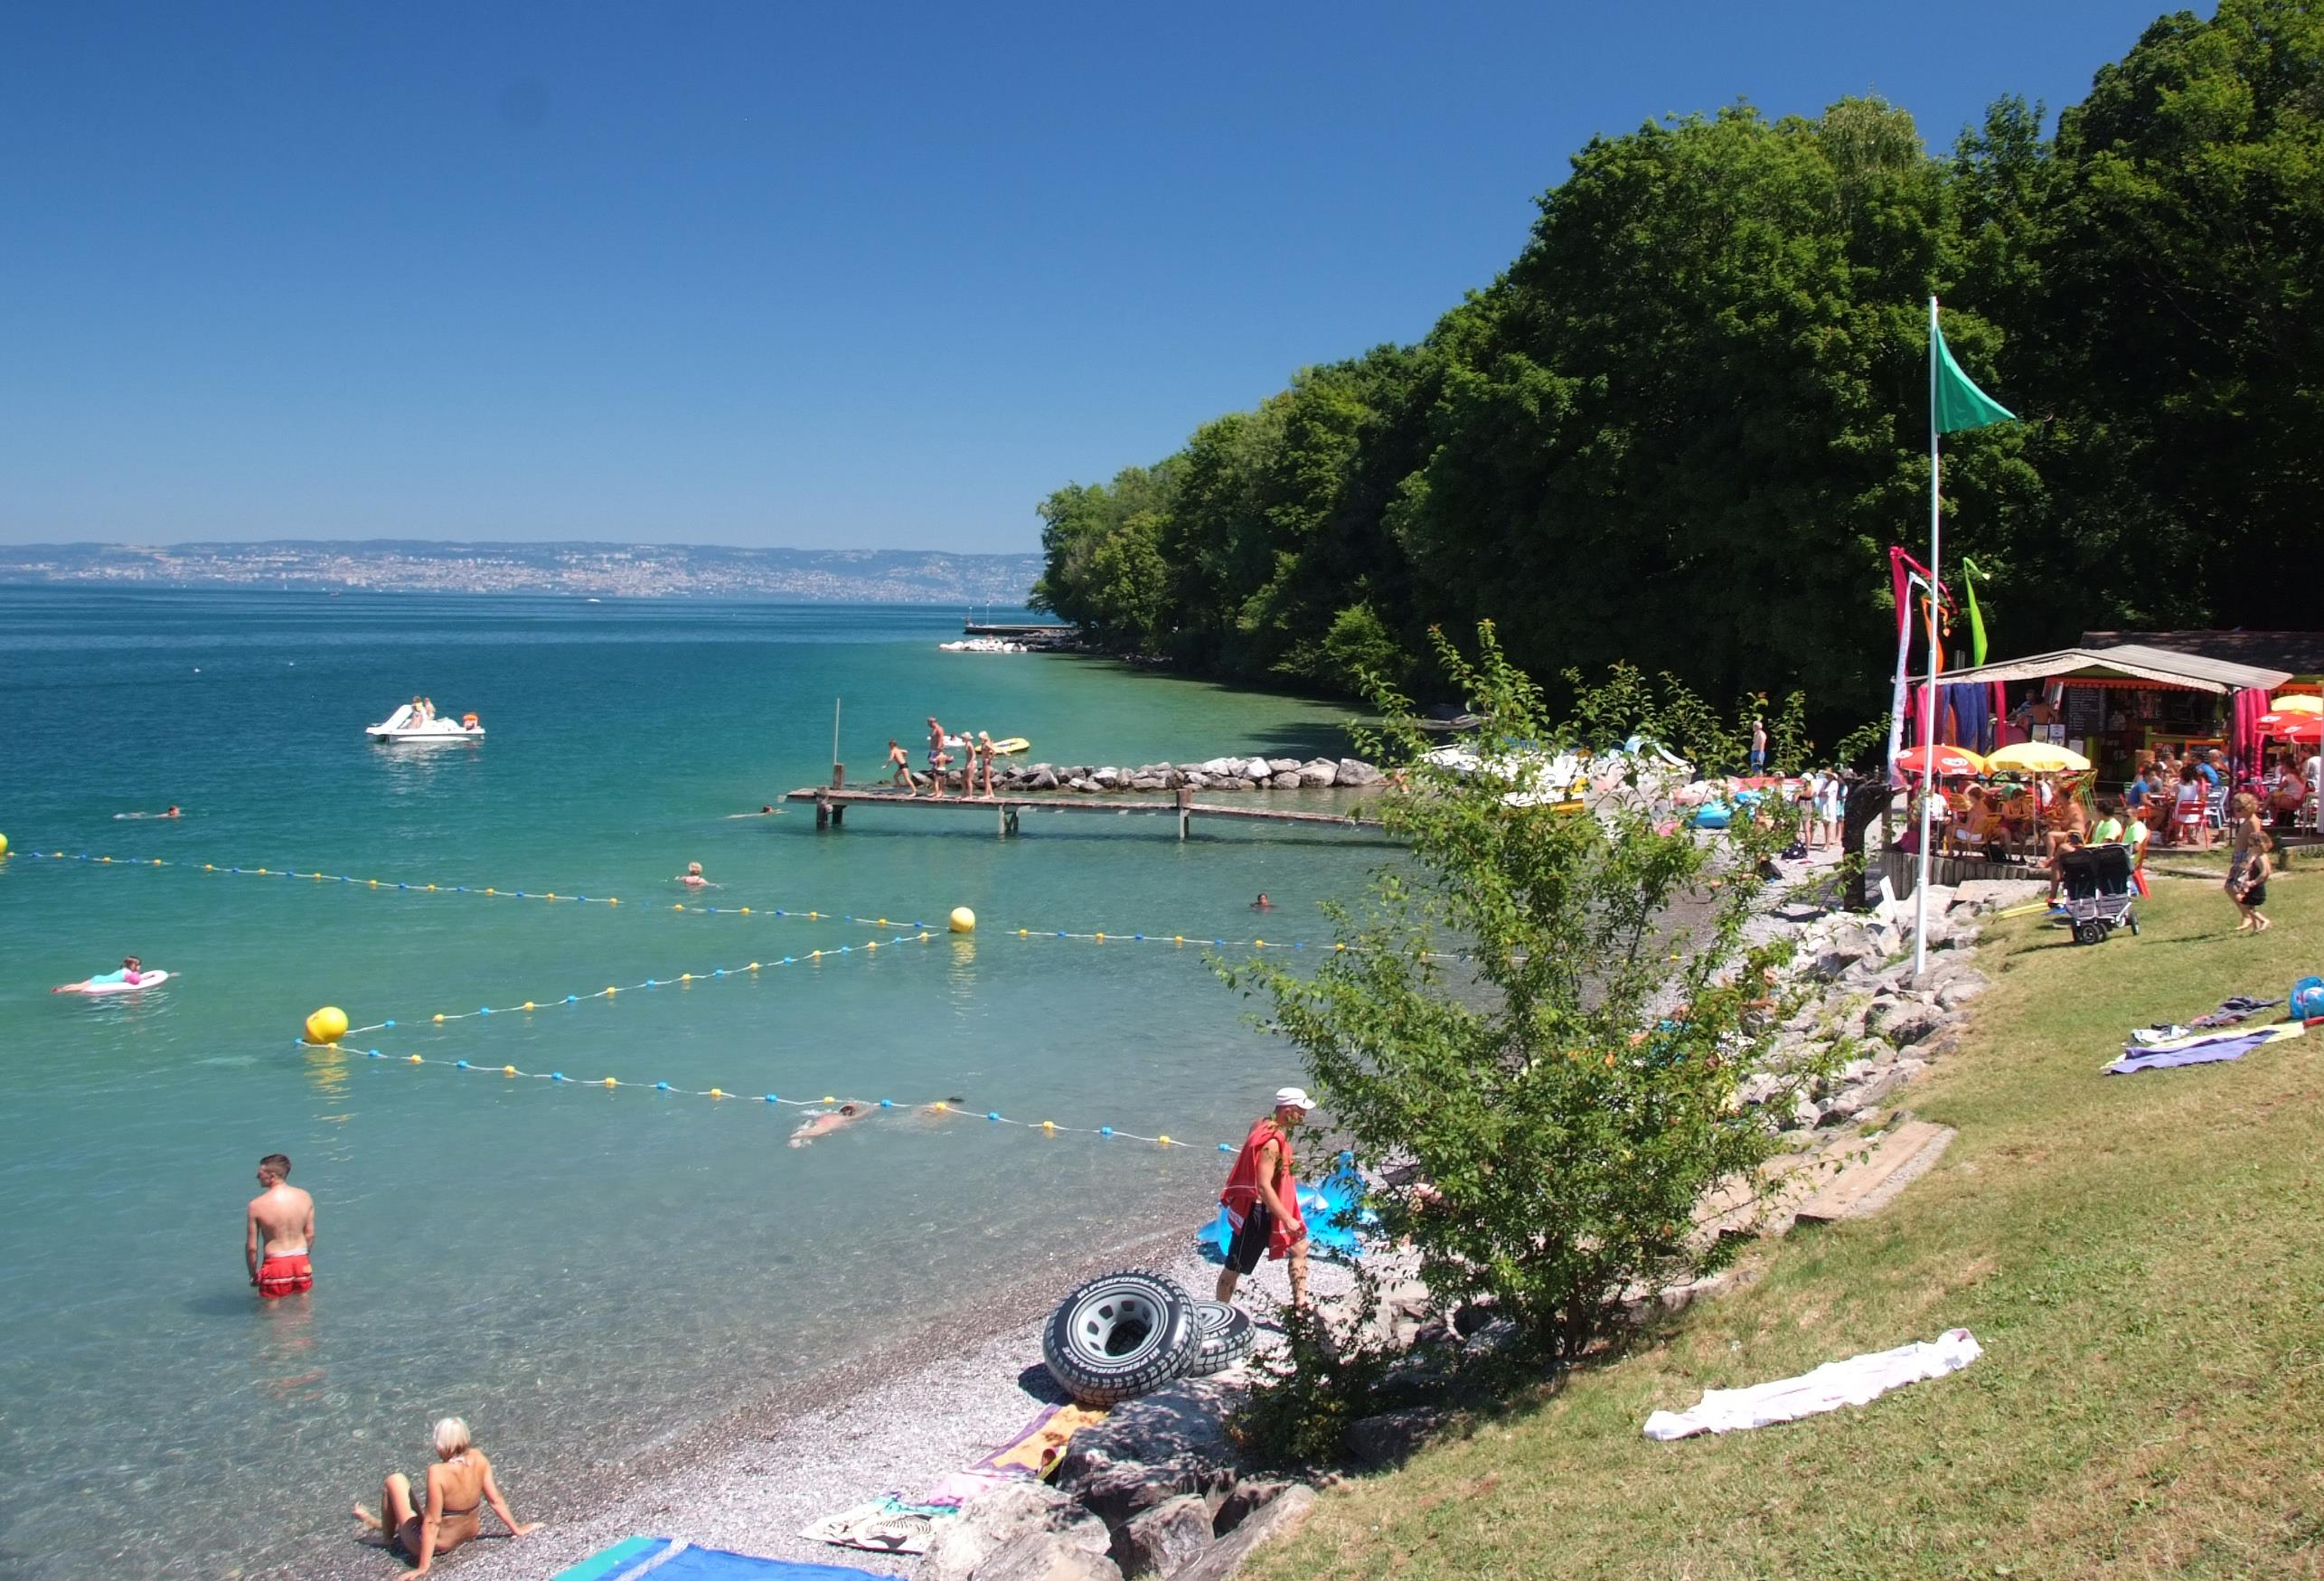 Camping Saint Disdille, Thonon-les-Bains, Haute-Savoie